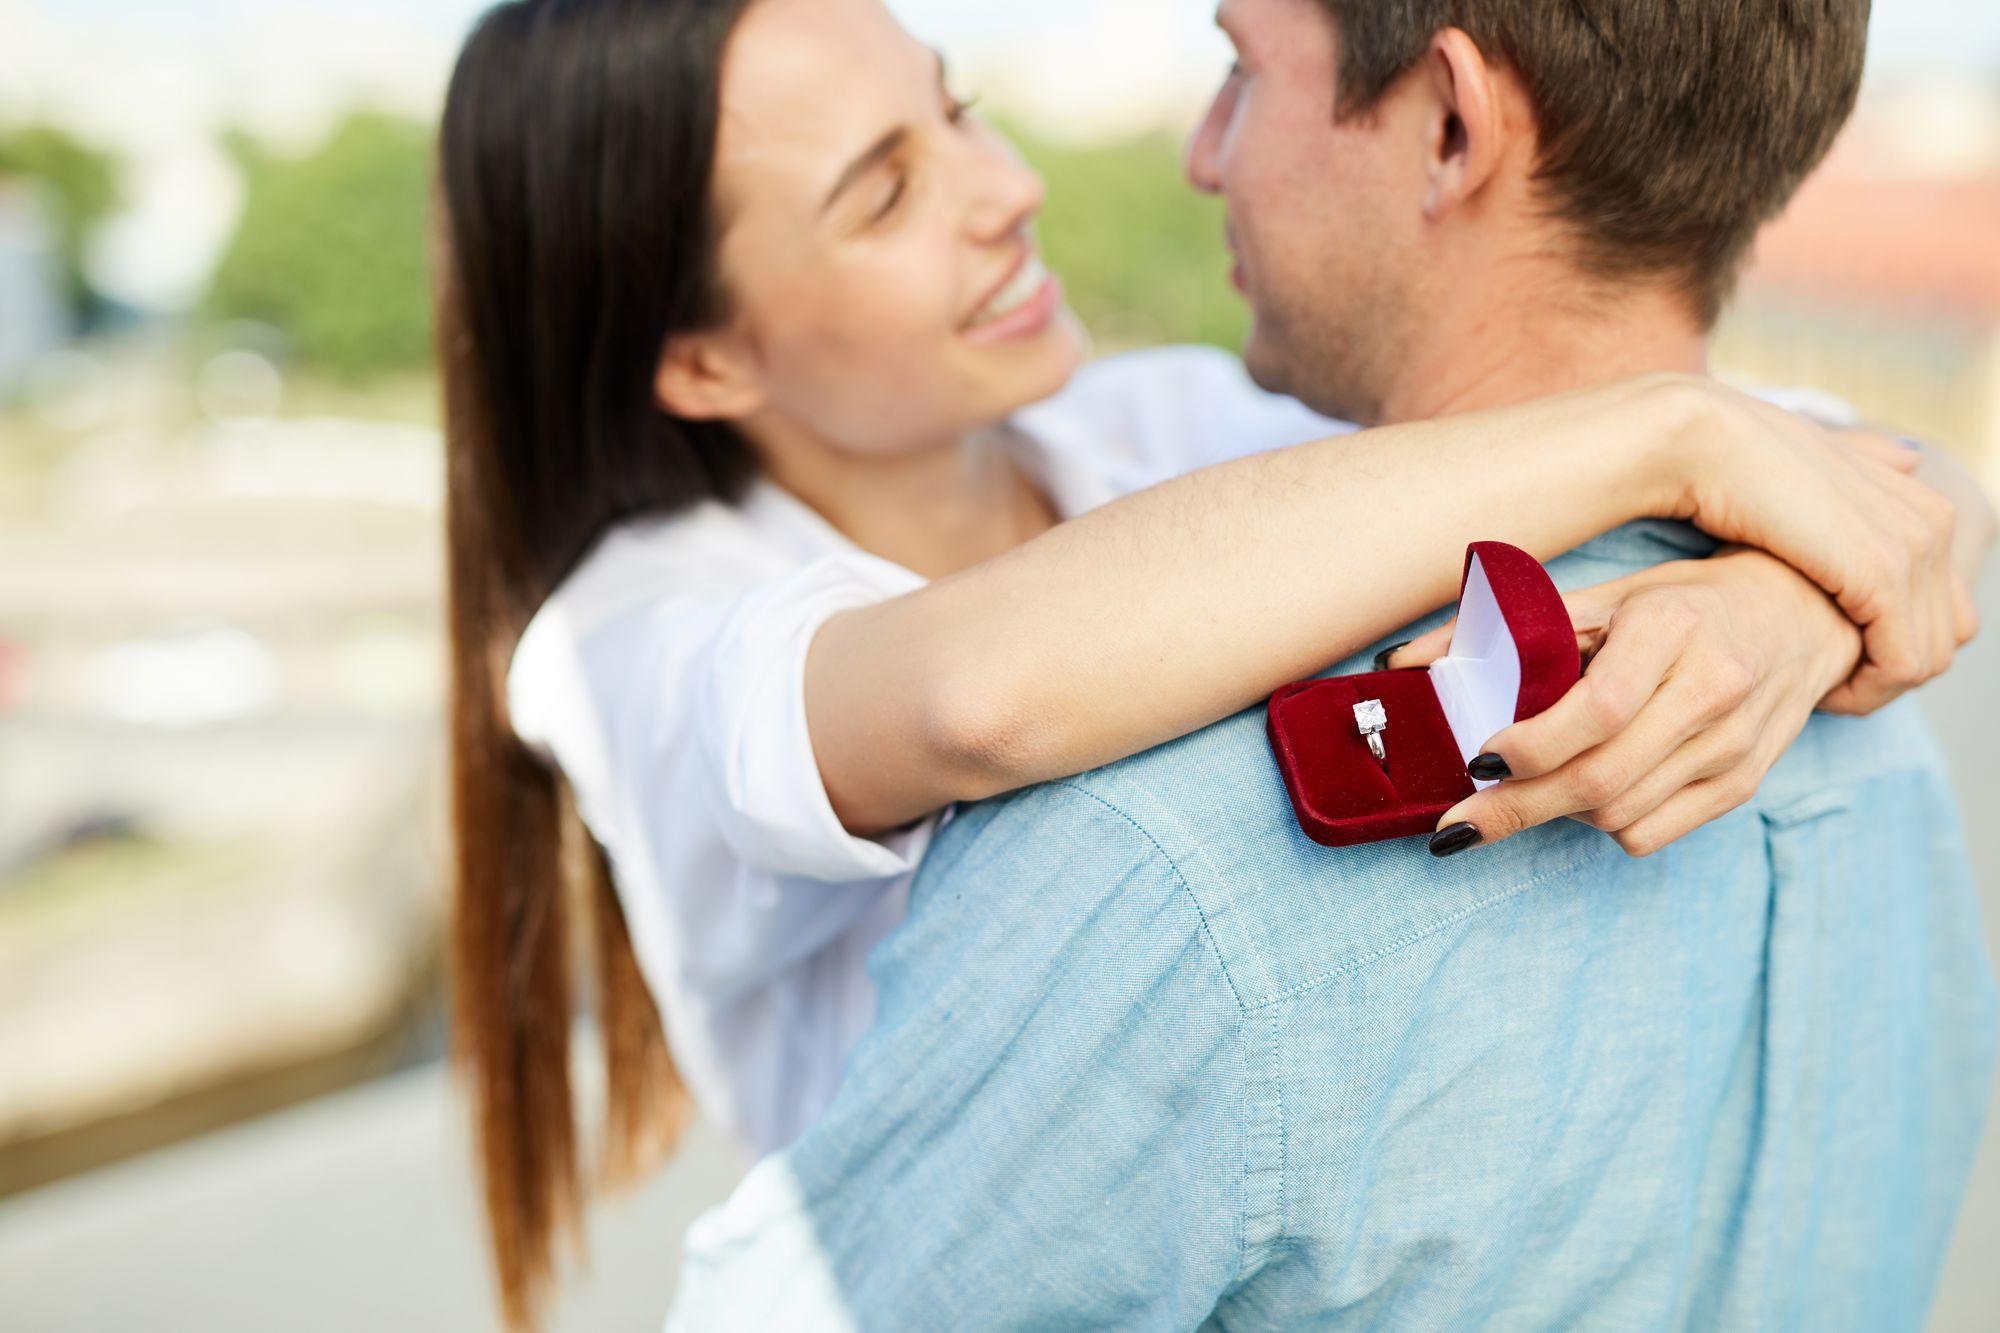 Heiratsantrag: So gelingt der perfekte Antrag | WeddyPlace